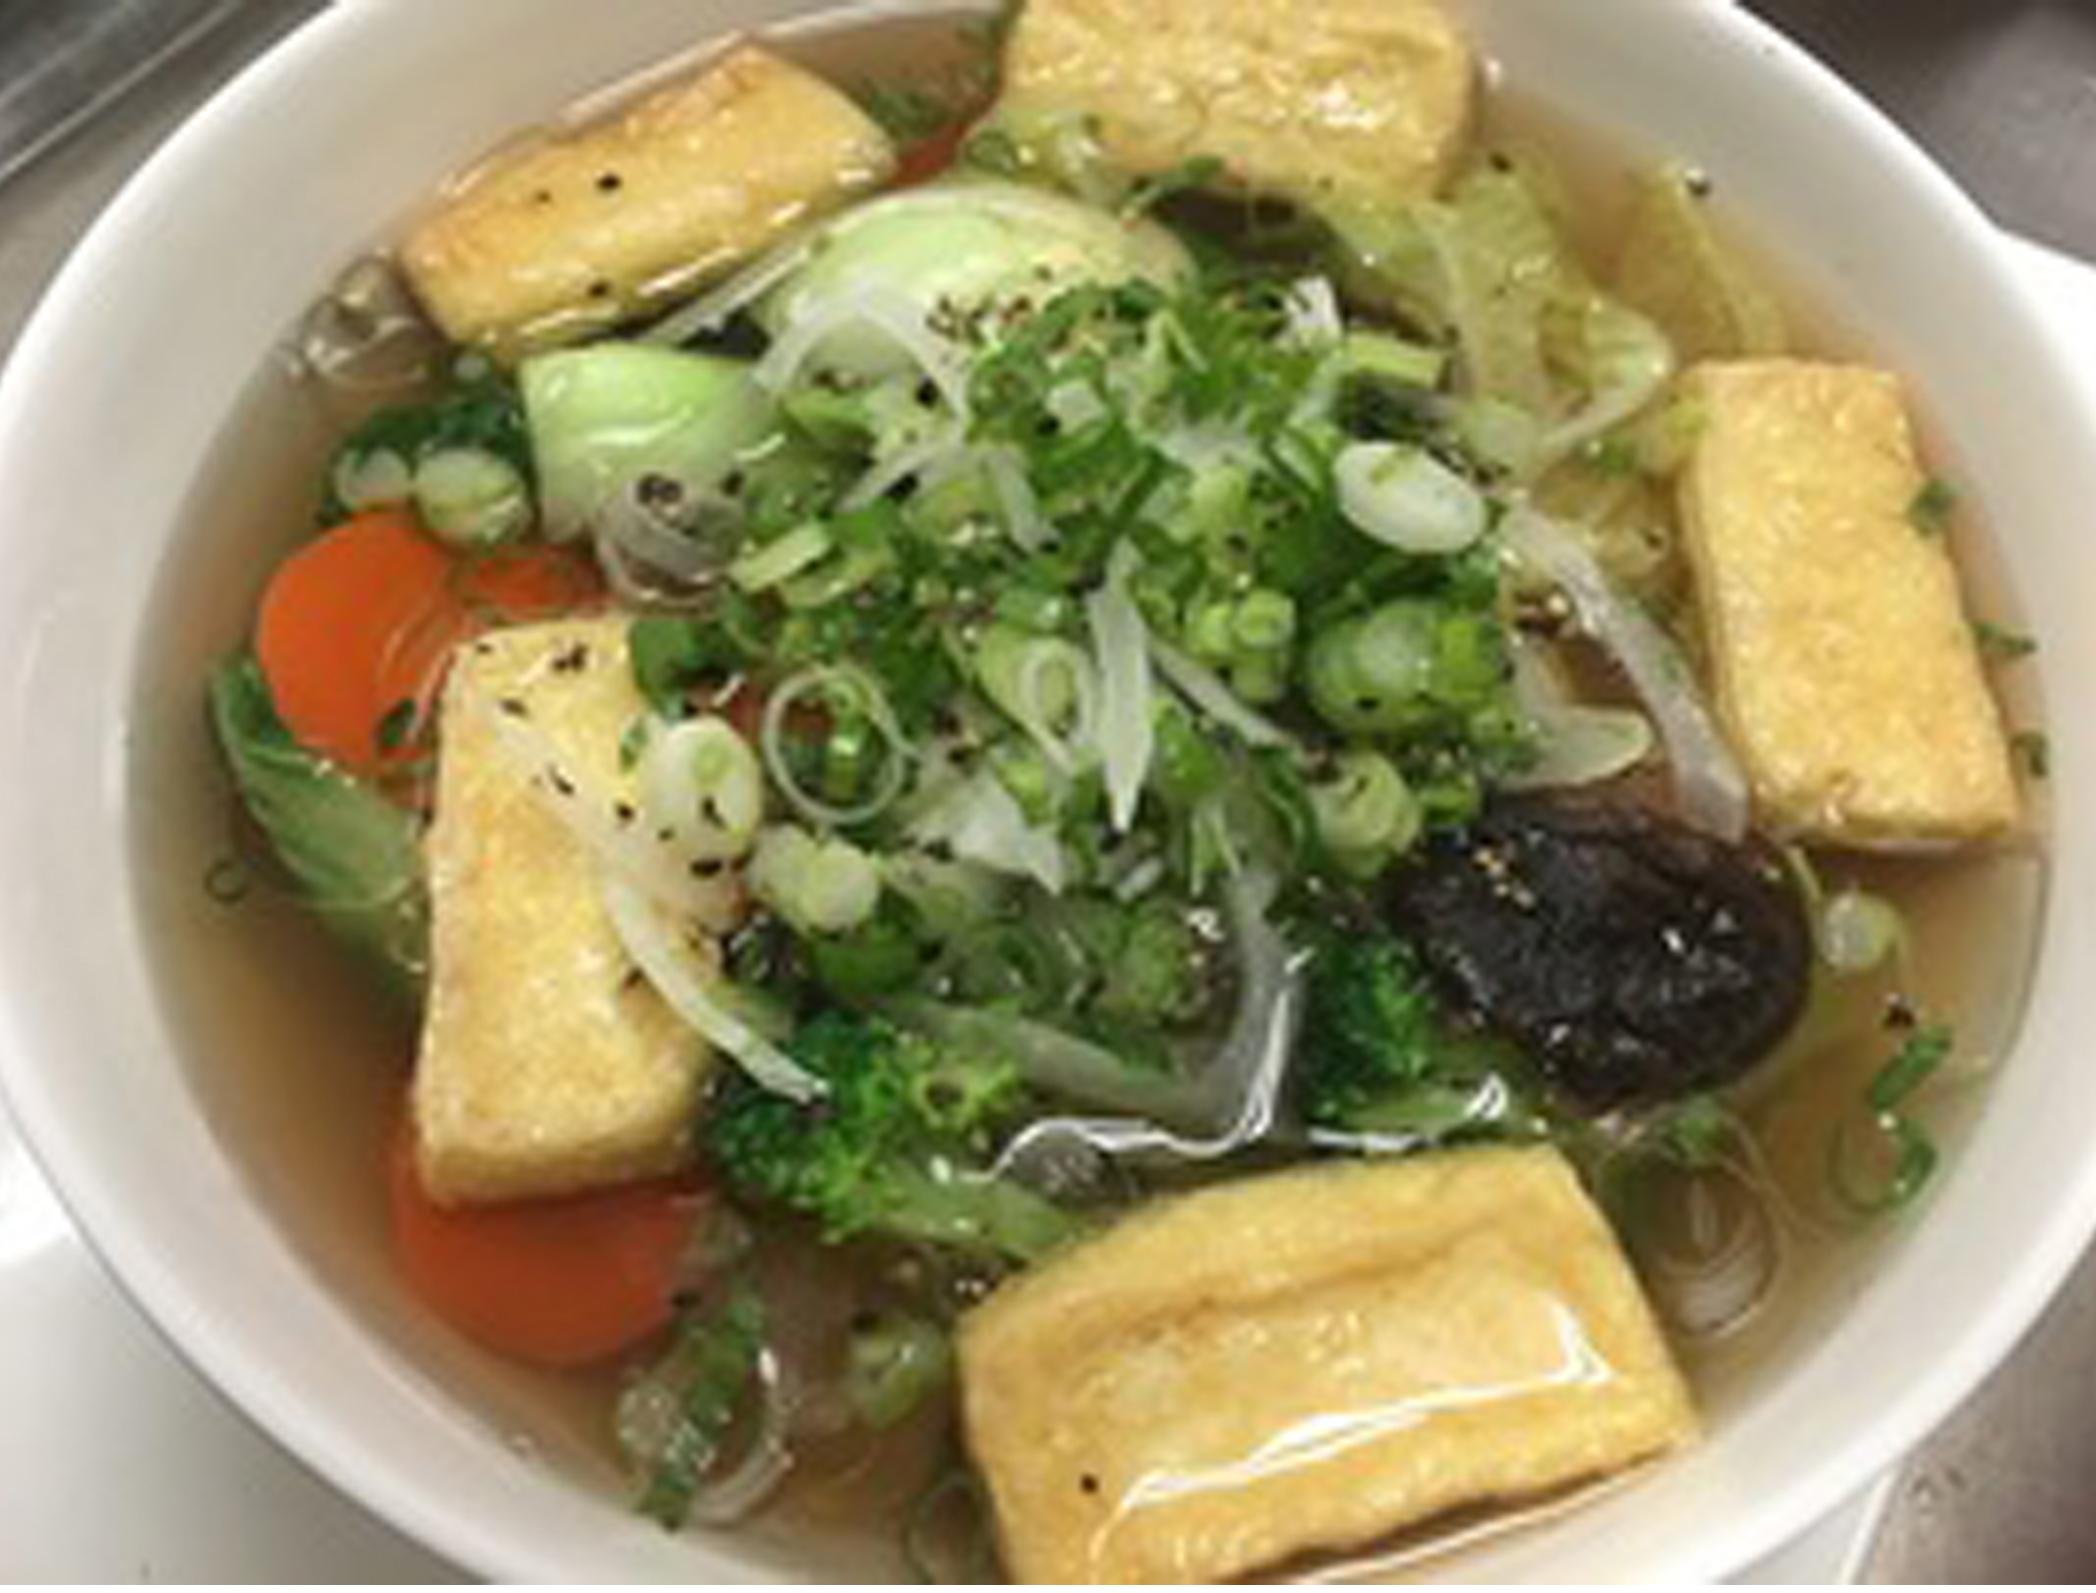 Tofu Pho - $5.99 Small / $7.99 Medium / $9.99 Large